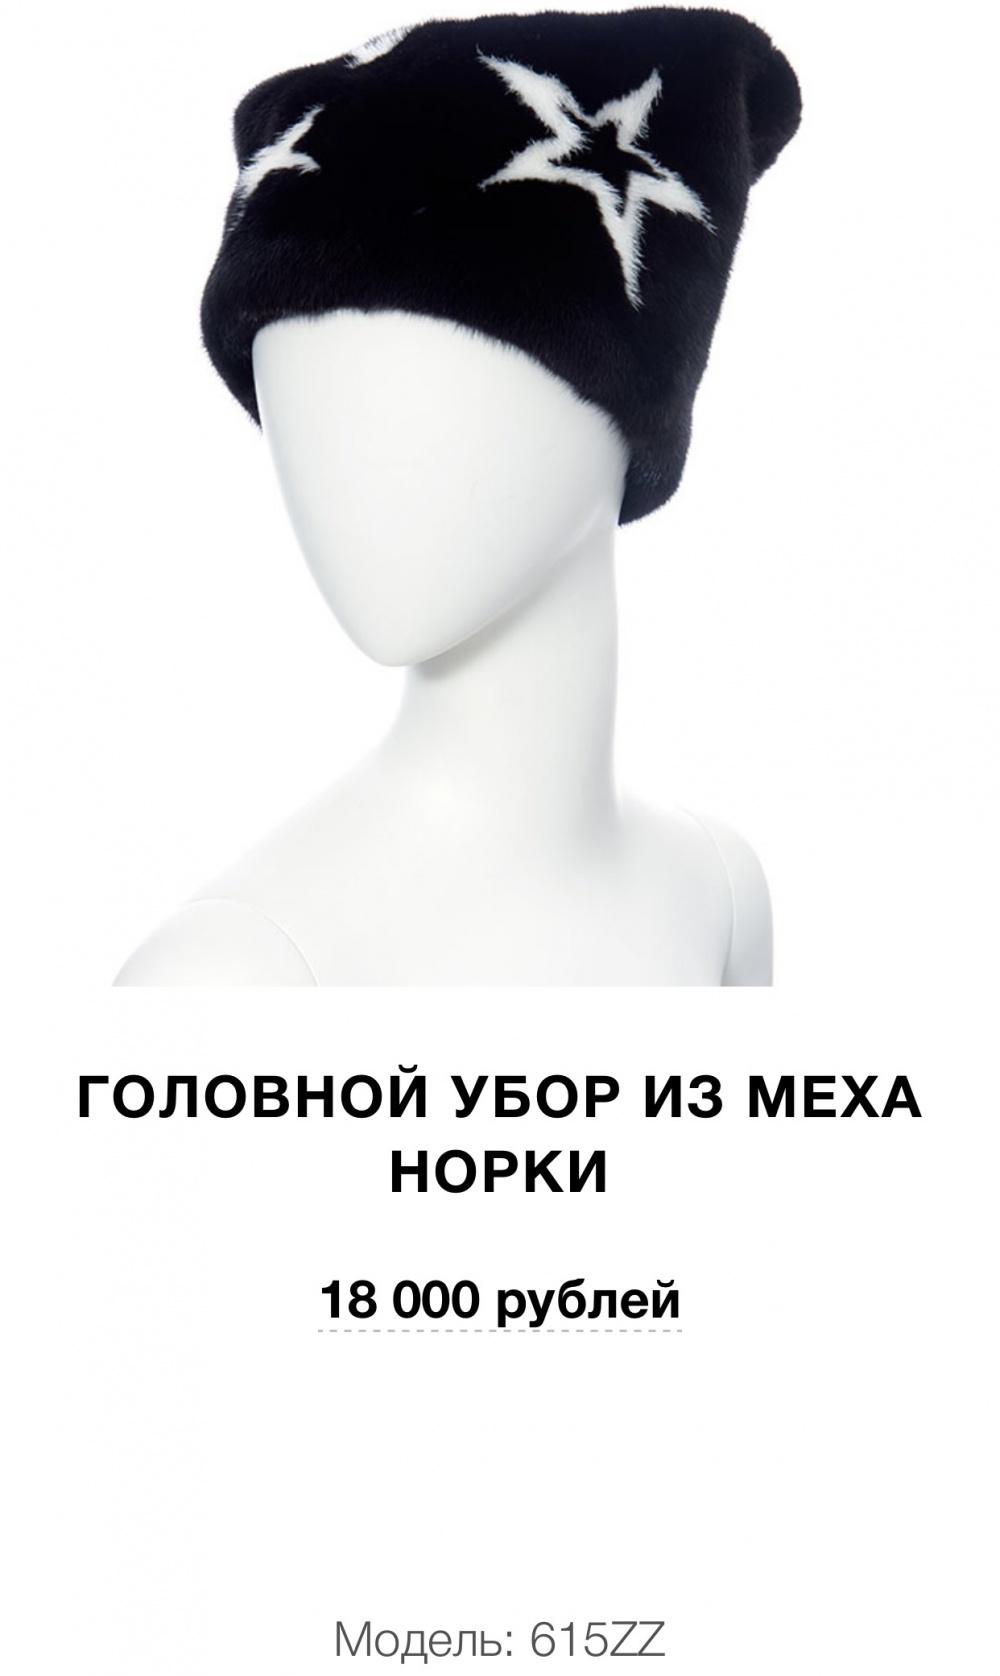 Норковая шапка ТД Екатерина, one size